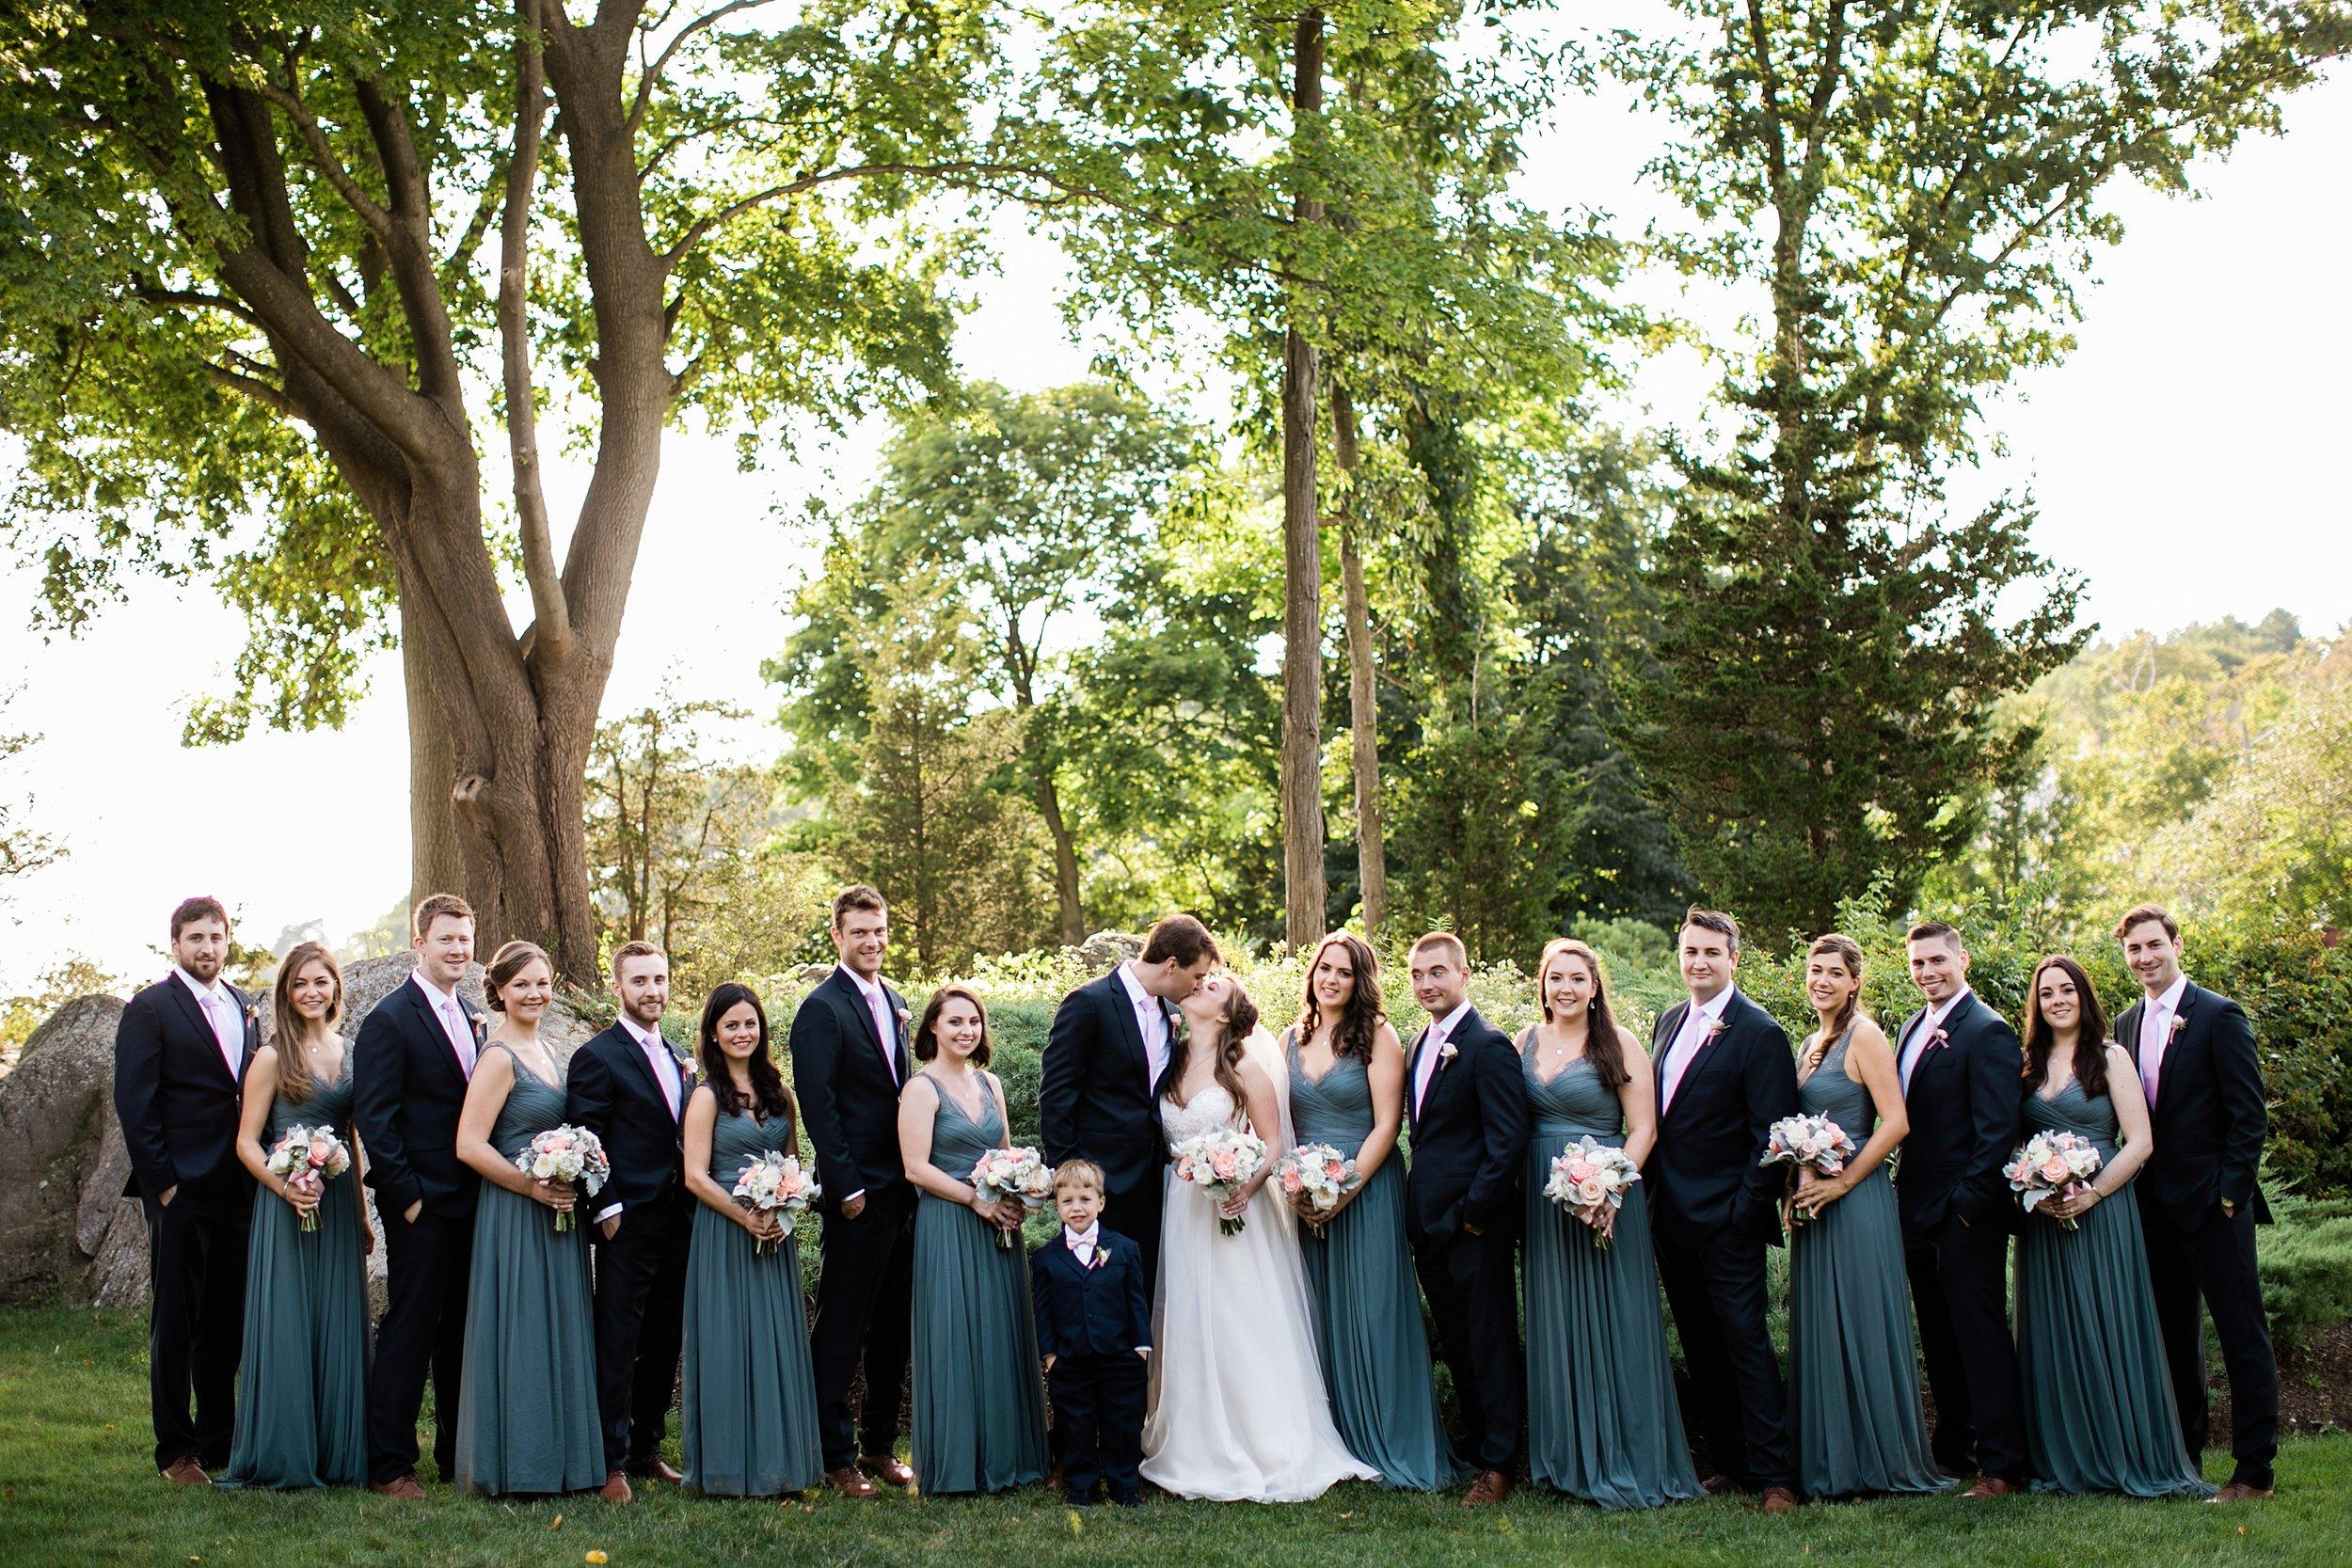 018 los angeles wedding photographer todd danforth photography boston.jpg